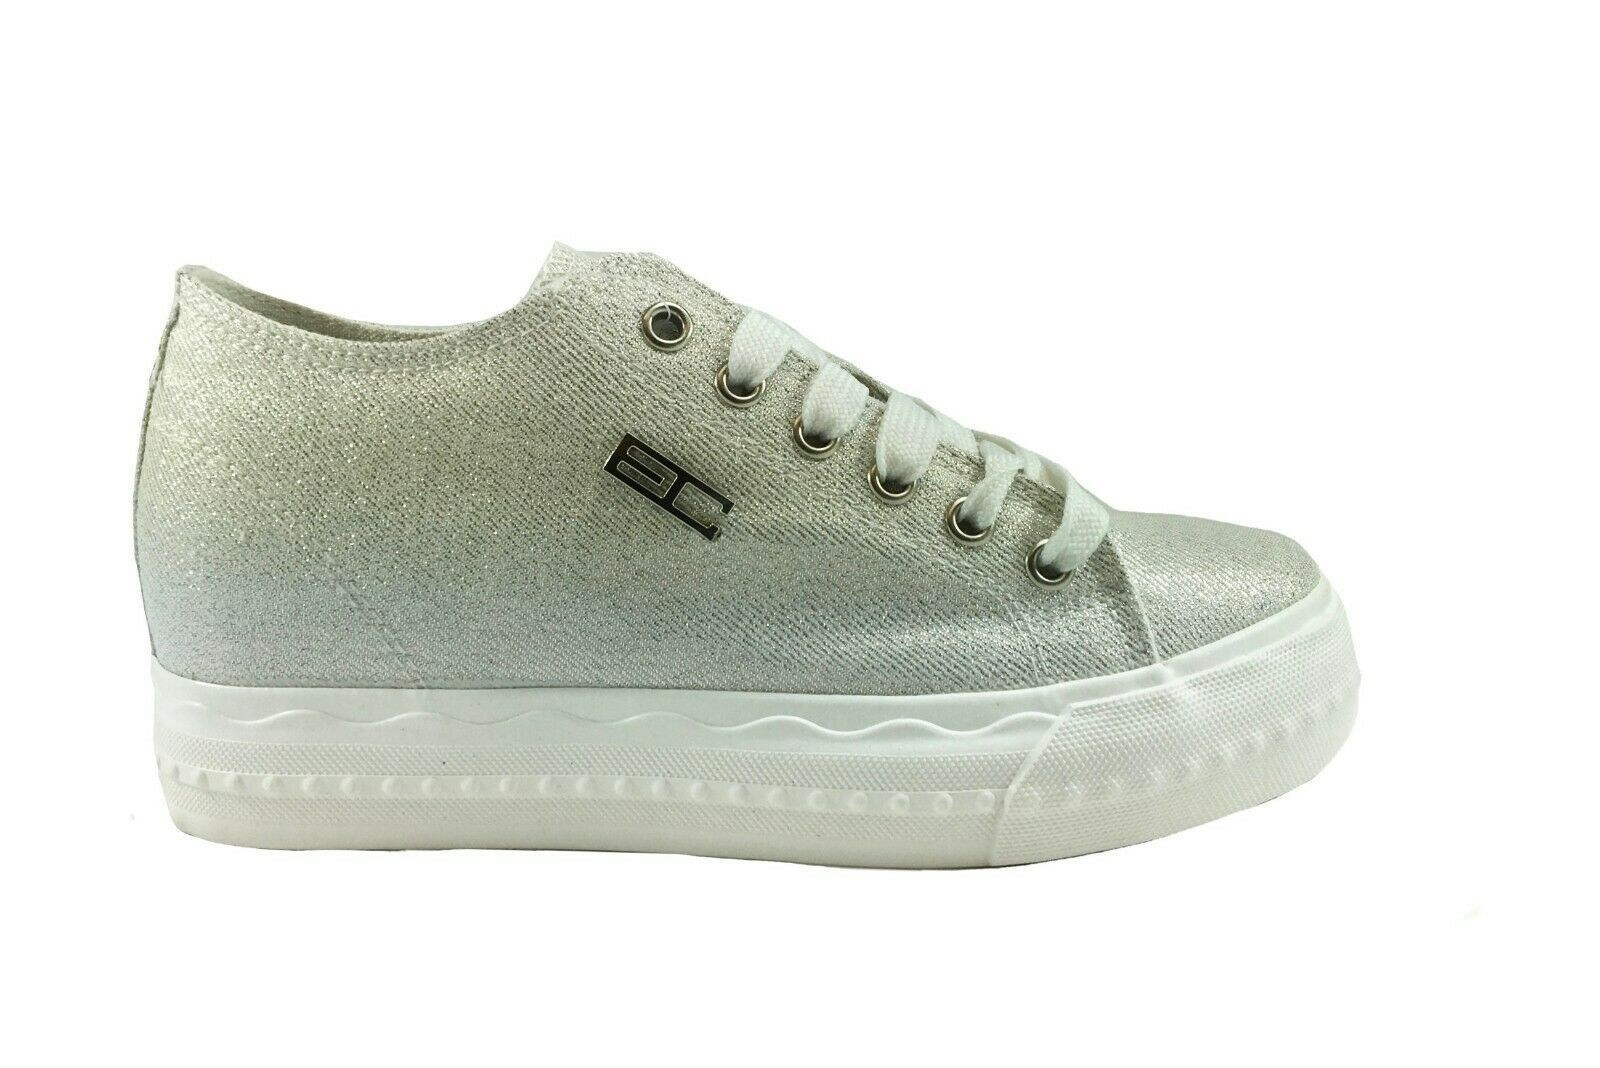 scarpe donna adidas con zeppa interna